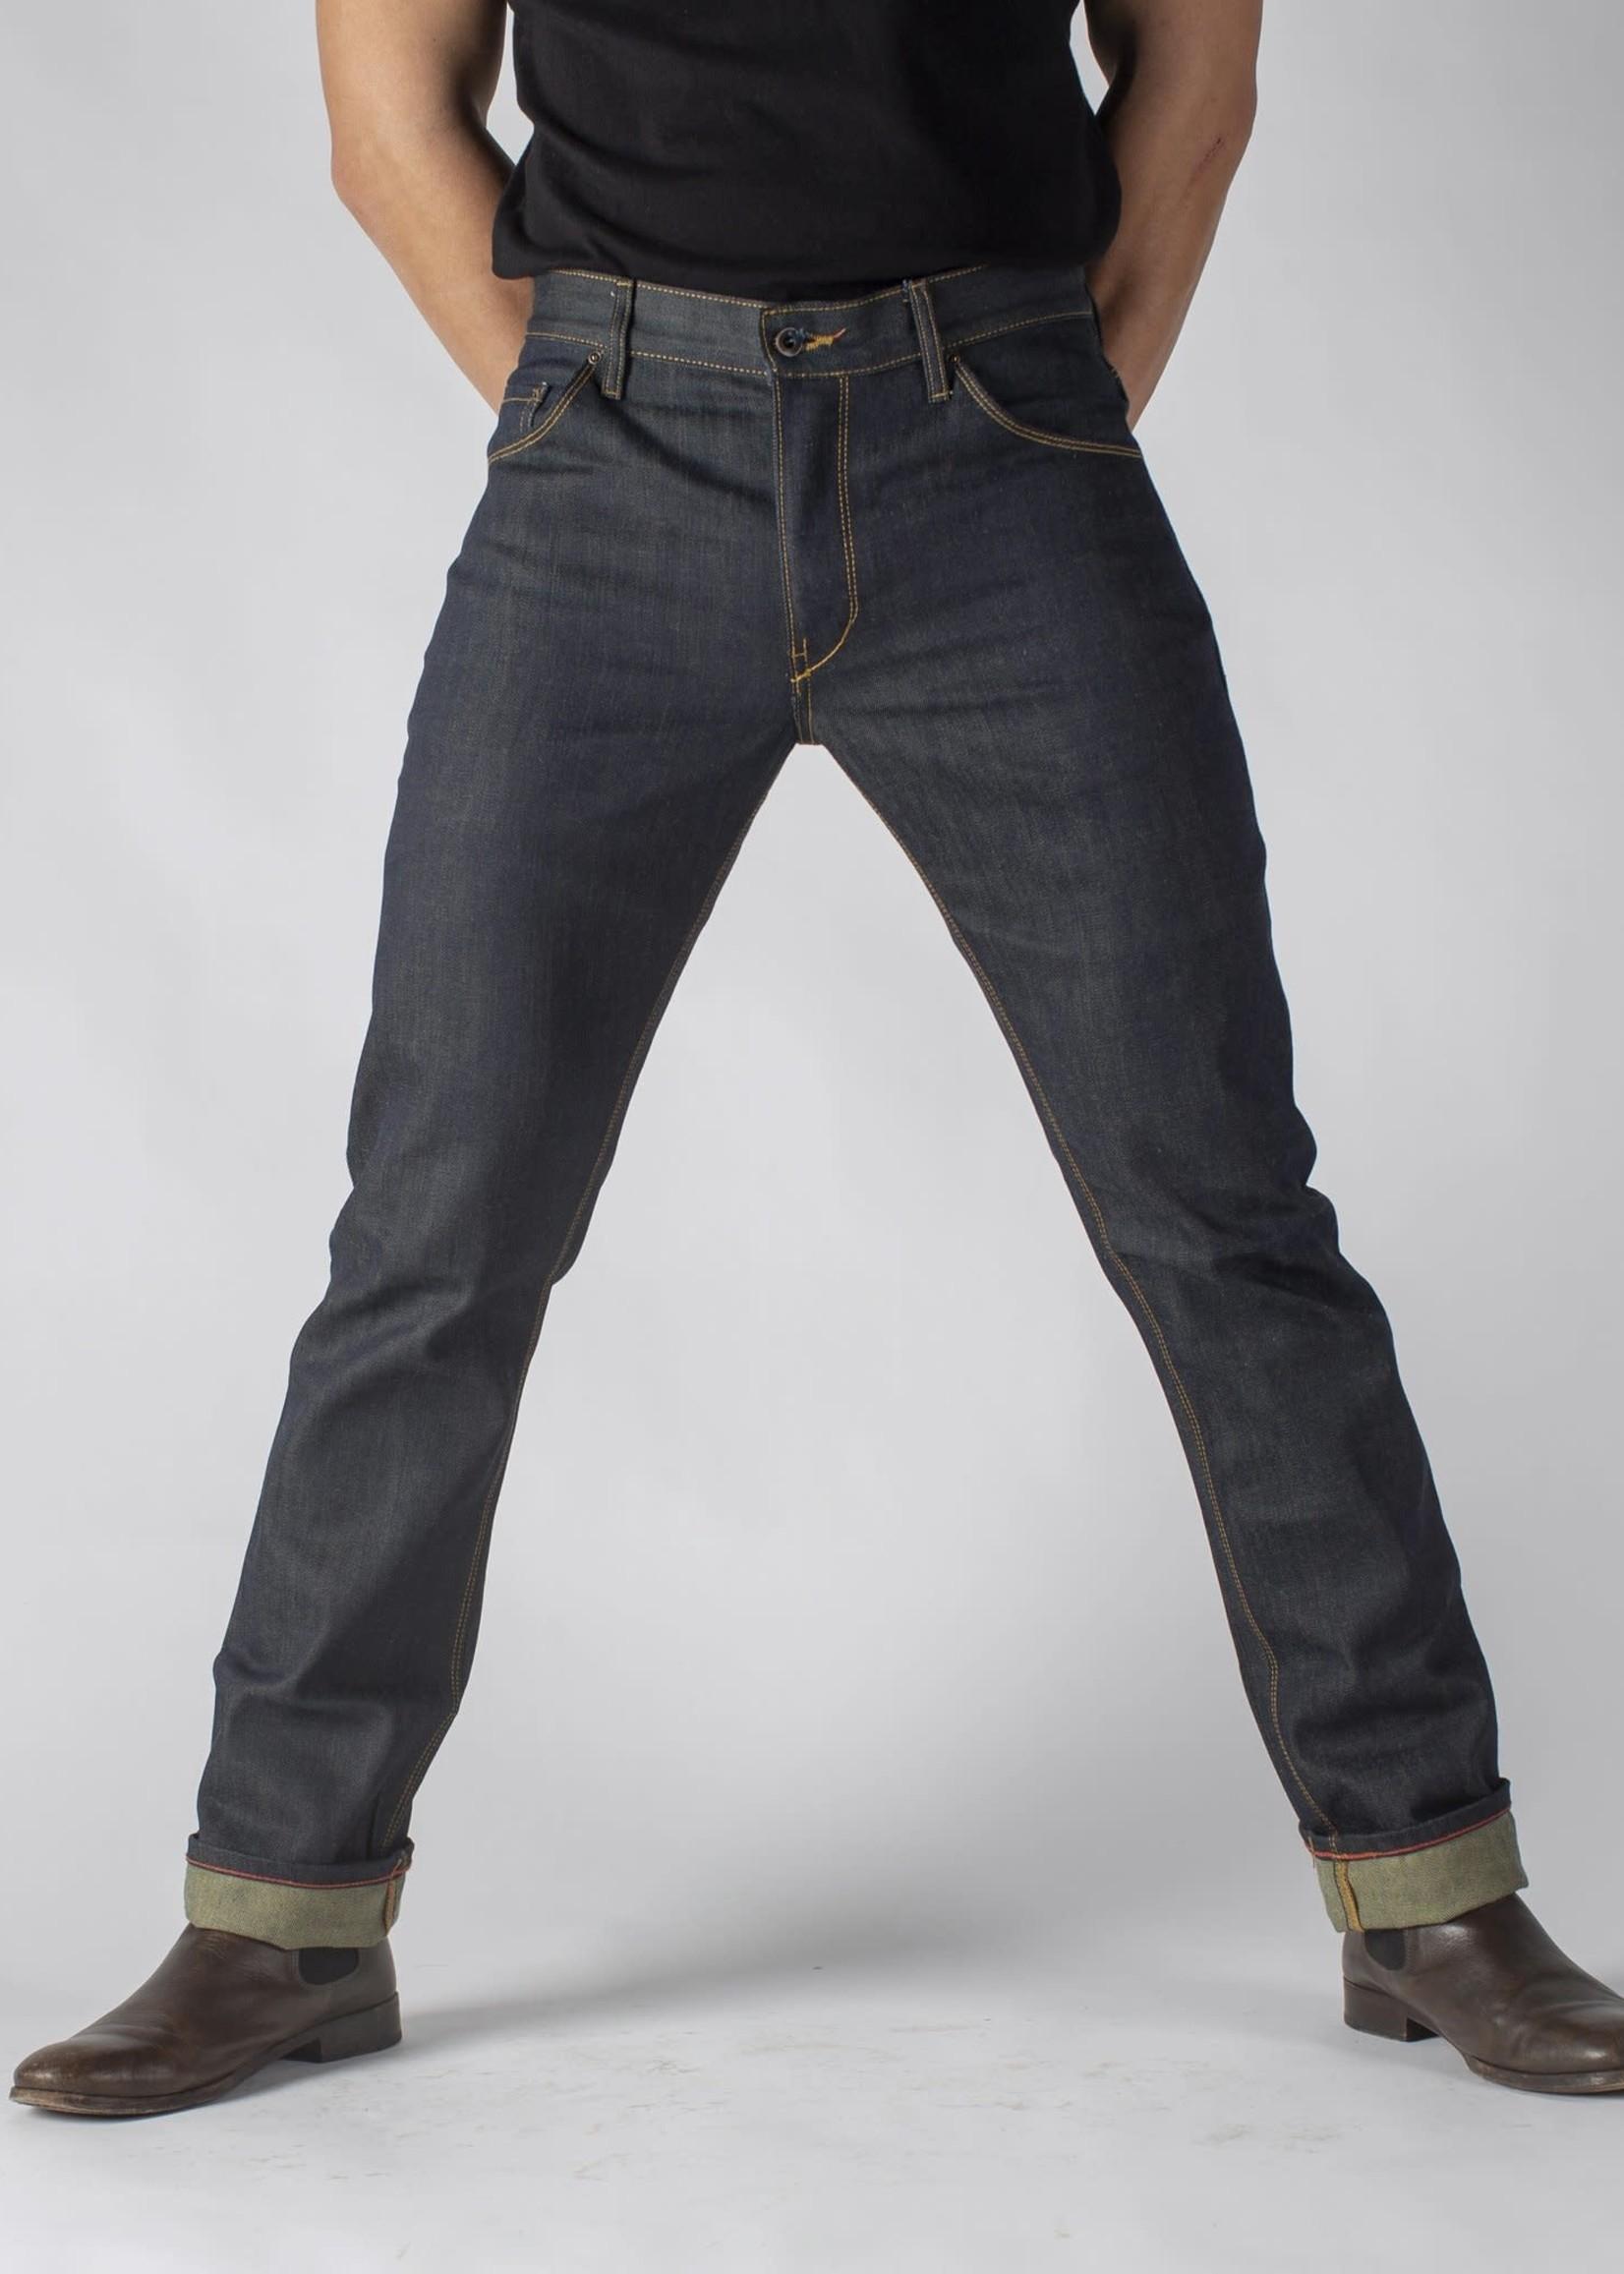 Raleigh Denim Workshop Raleigh Jones 5 Pocket Jean Selvedge Original